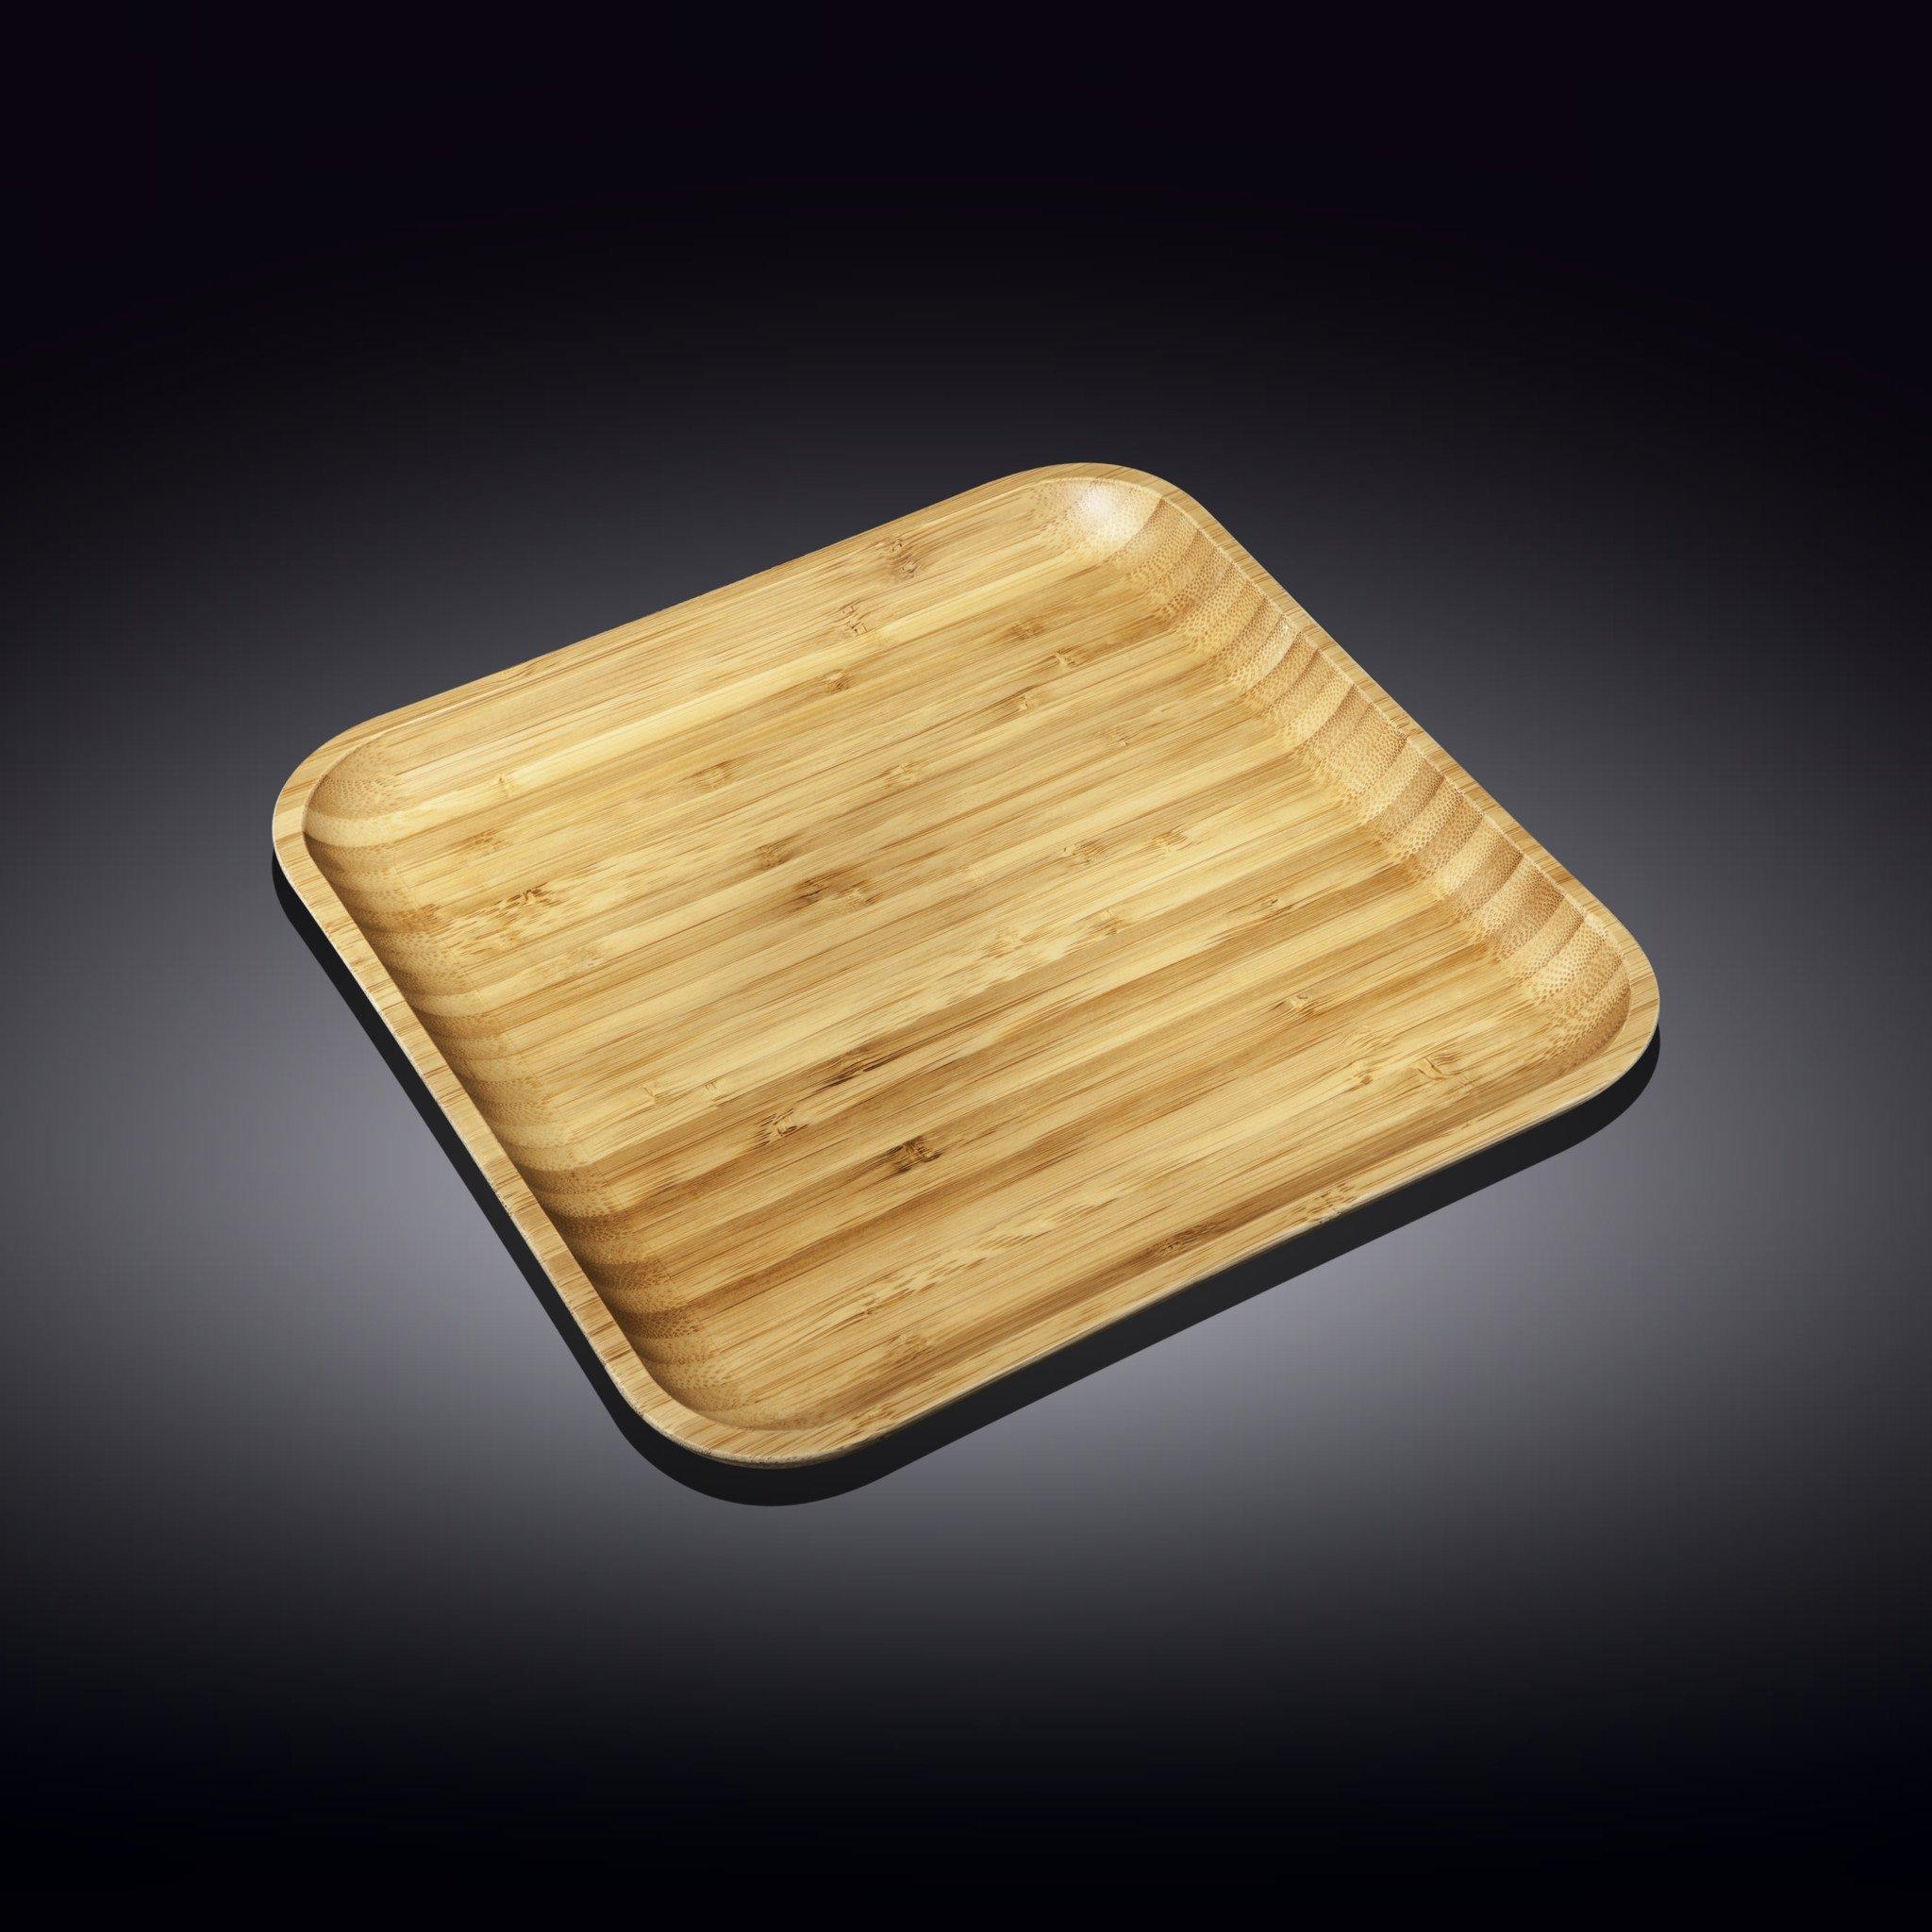 Тарелка бамбуковая Wilmax сервировочная квадратная 28х28 см